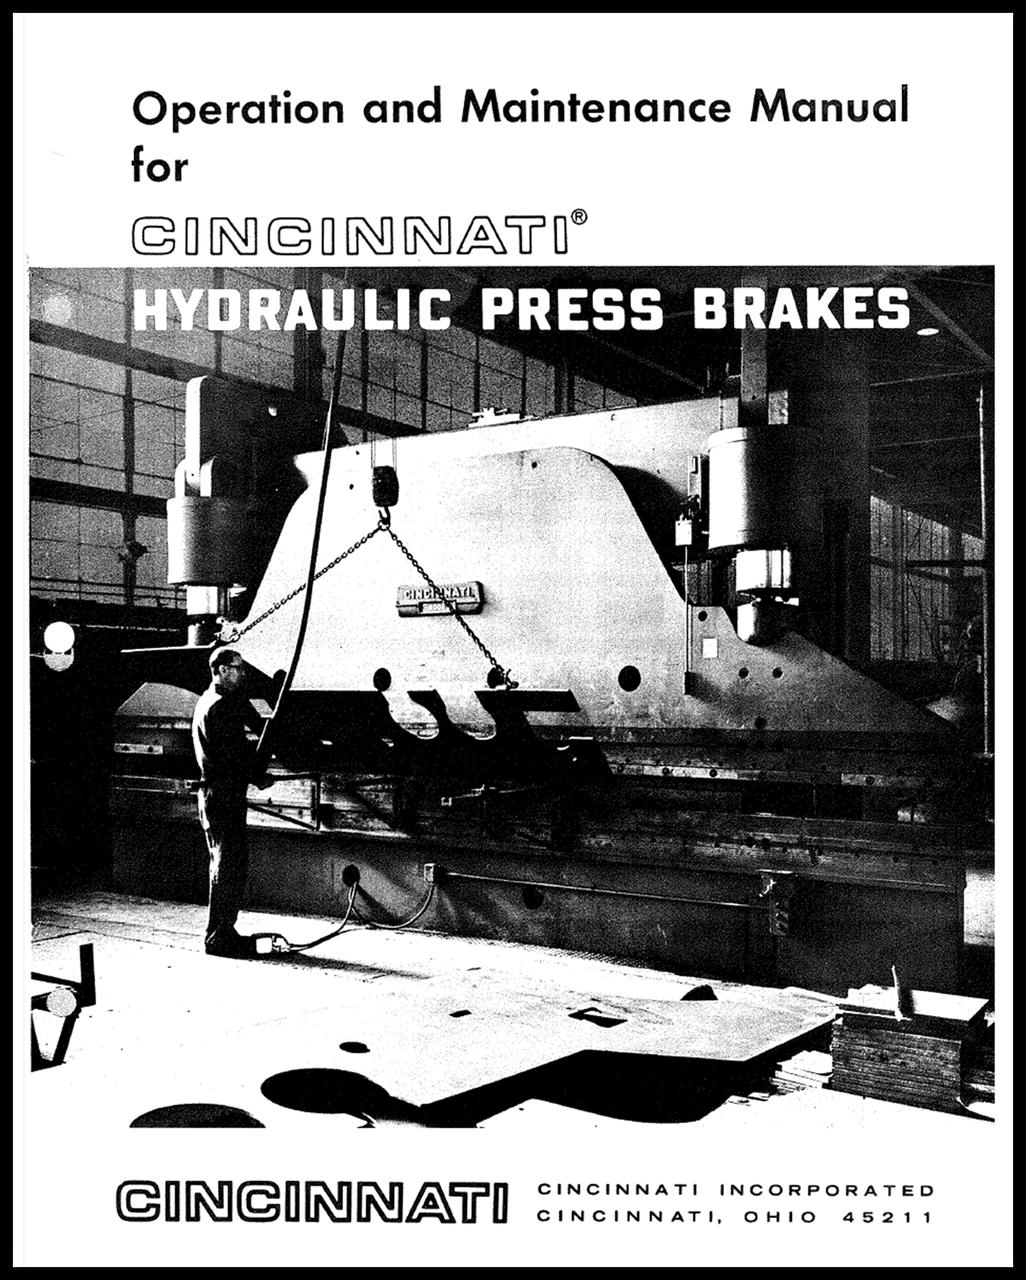 FORM 70012 - HYDRAULIC PRESS BRAKES - Operation and Maintenance Manual